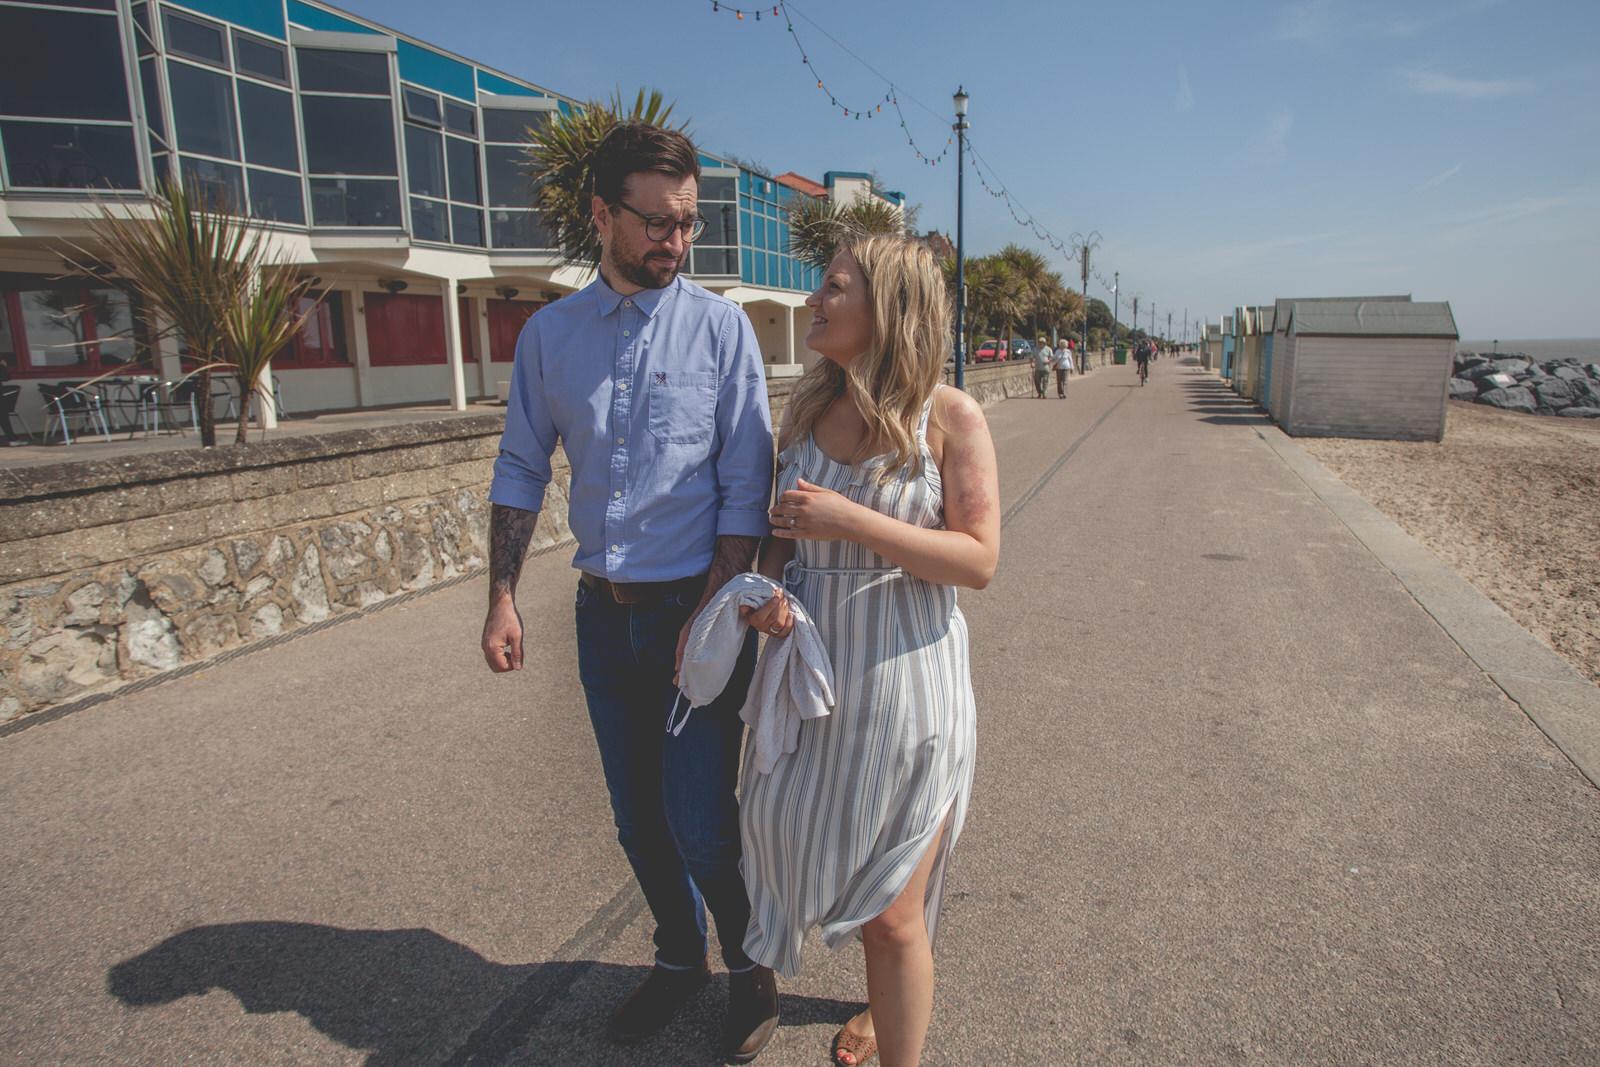 Felixstowe Beachfront Engagement - Sinead  Ryan - 038.jpg